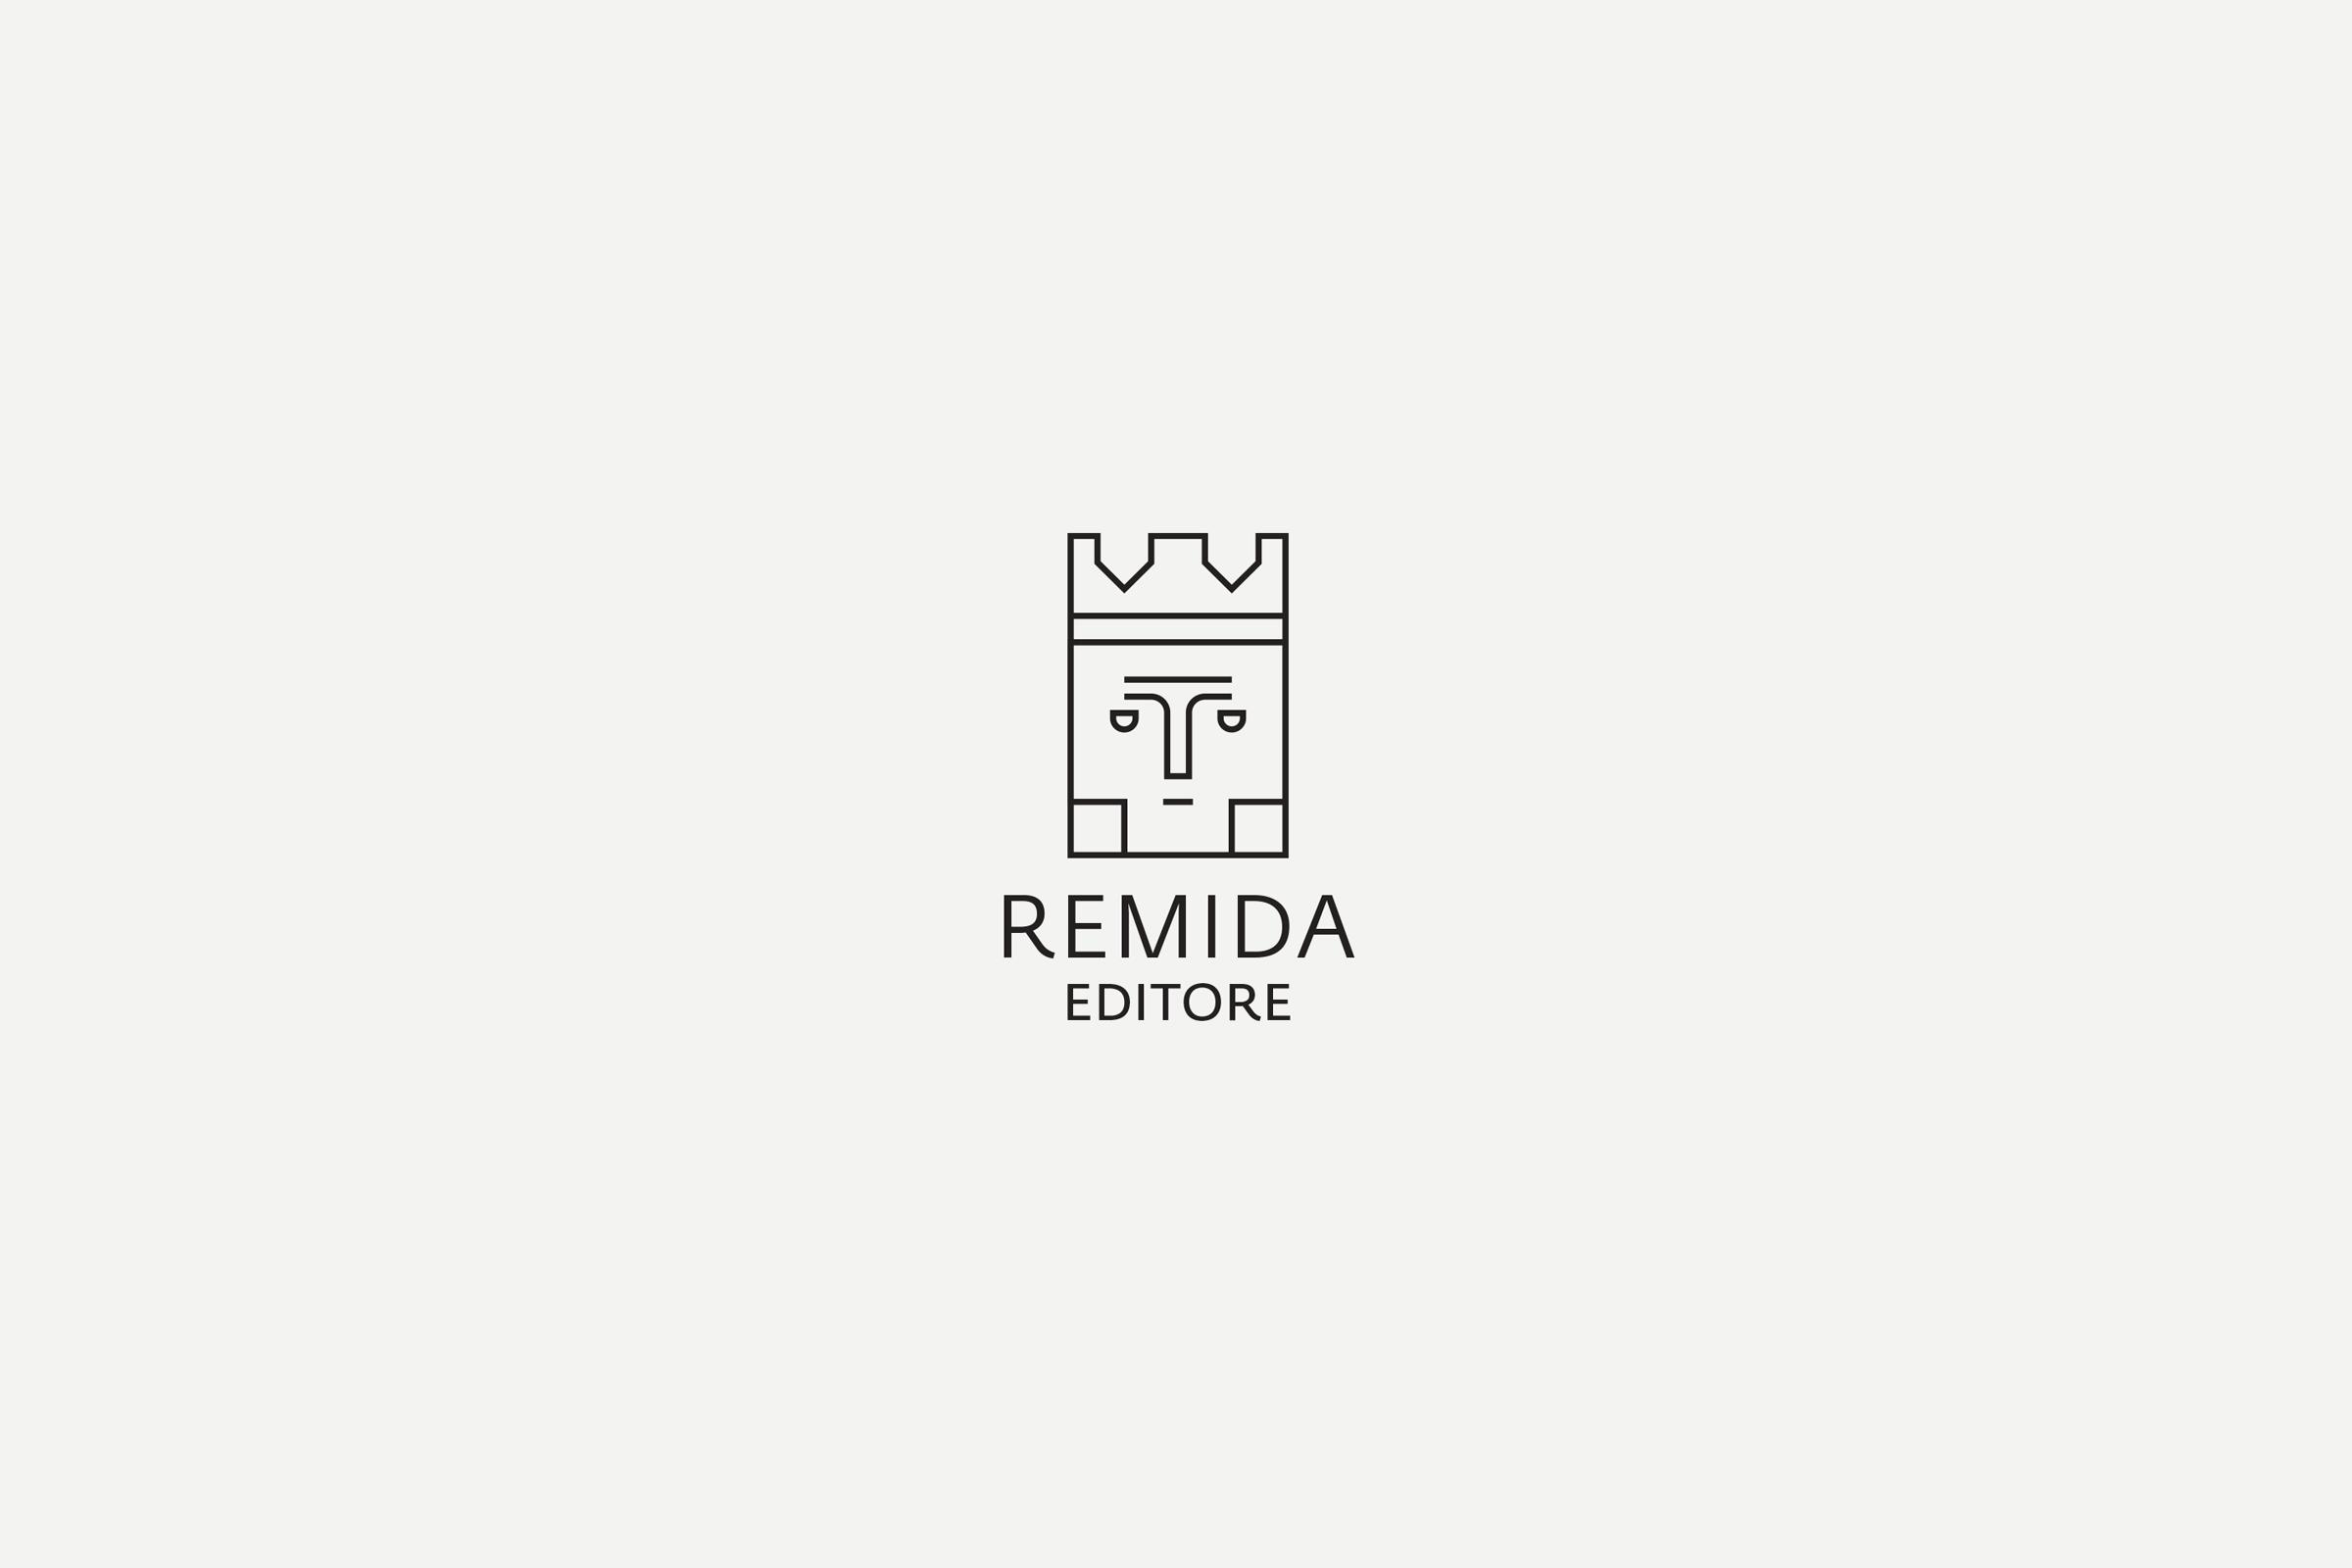 remida_1